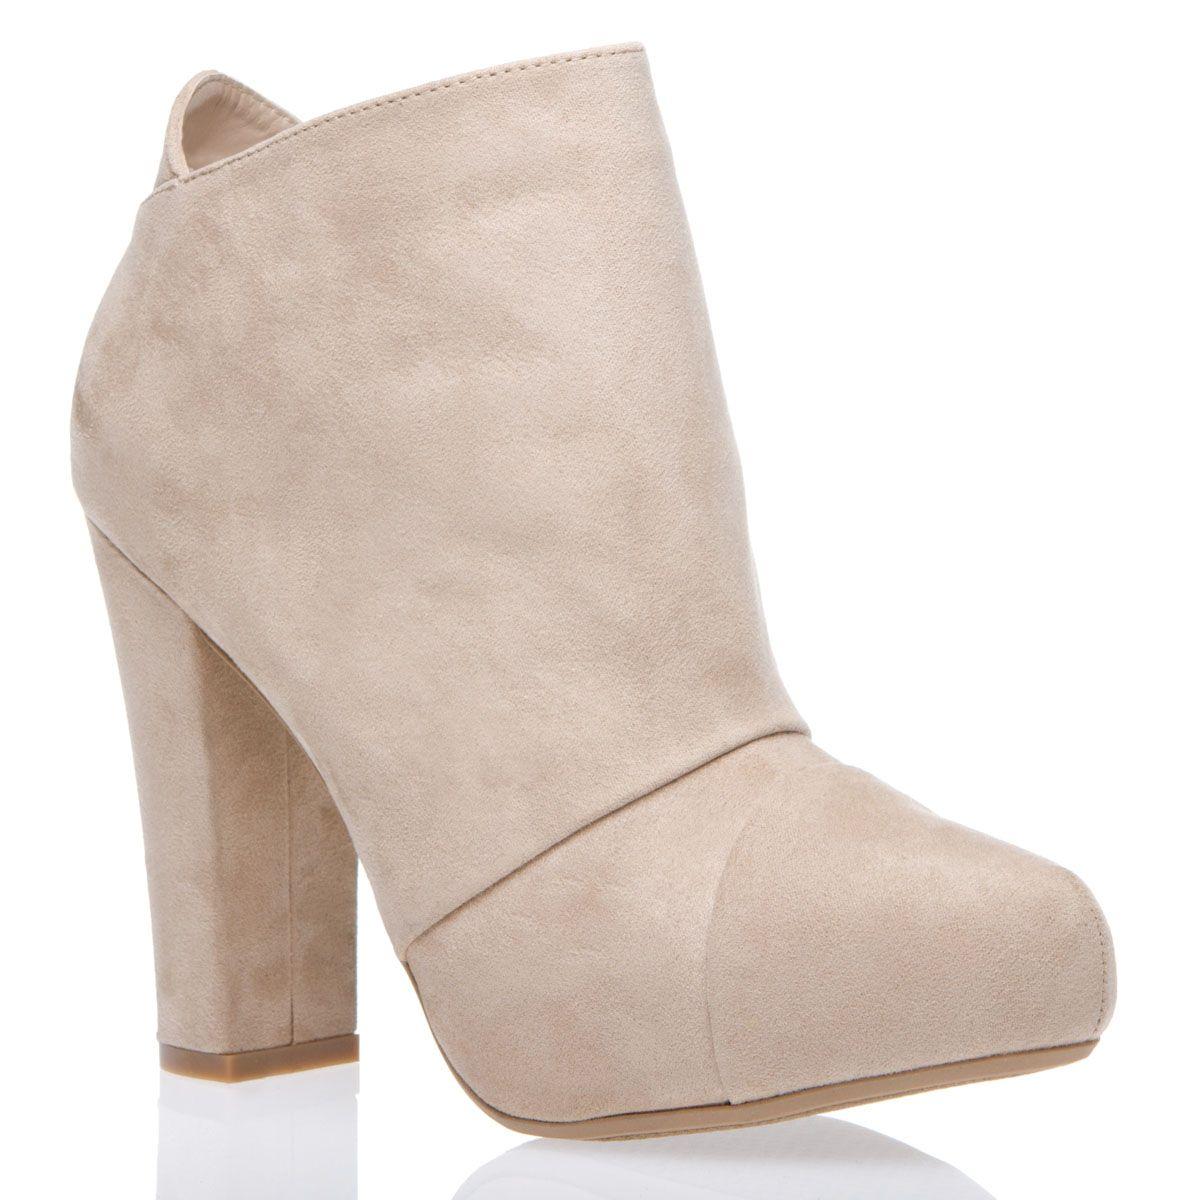 Fall boots - cute!